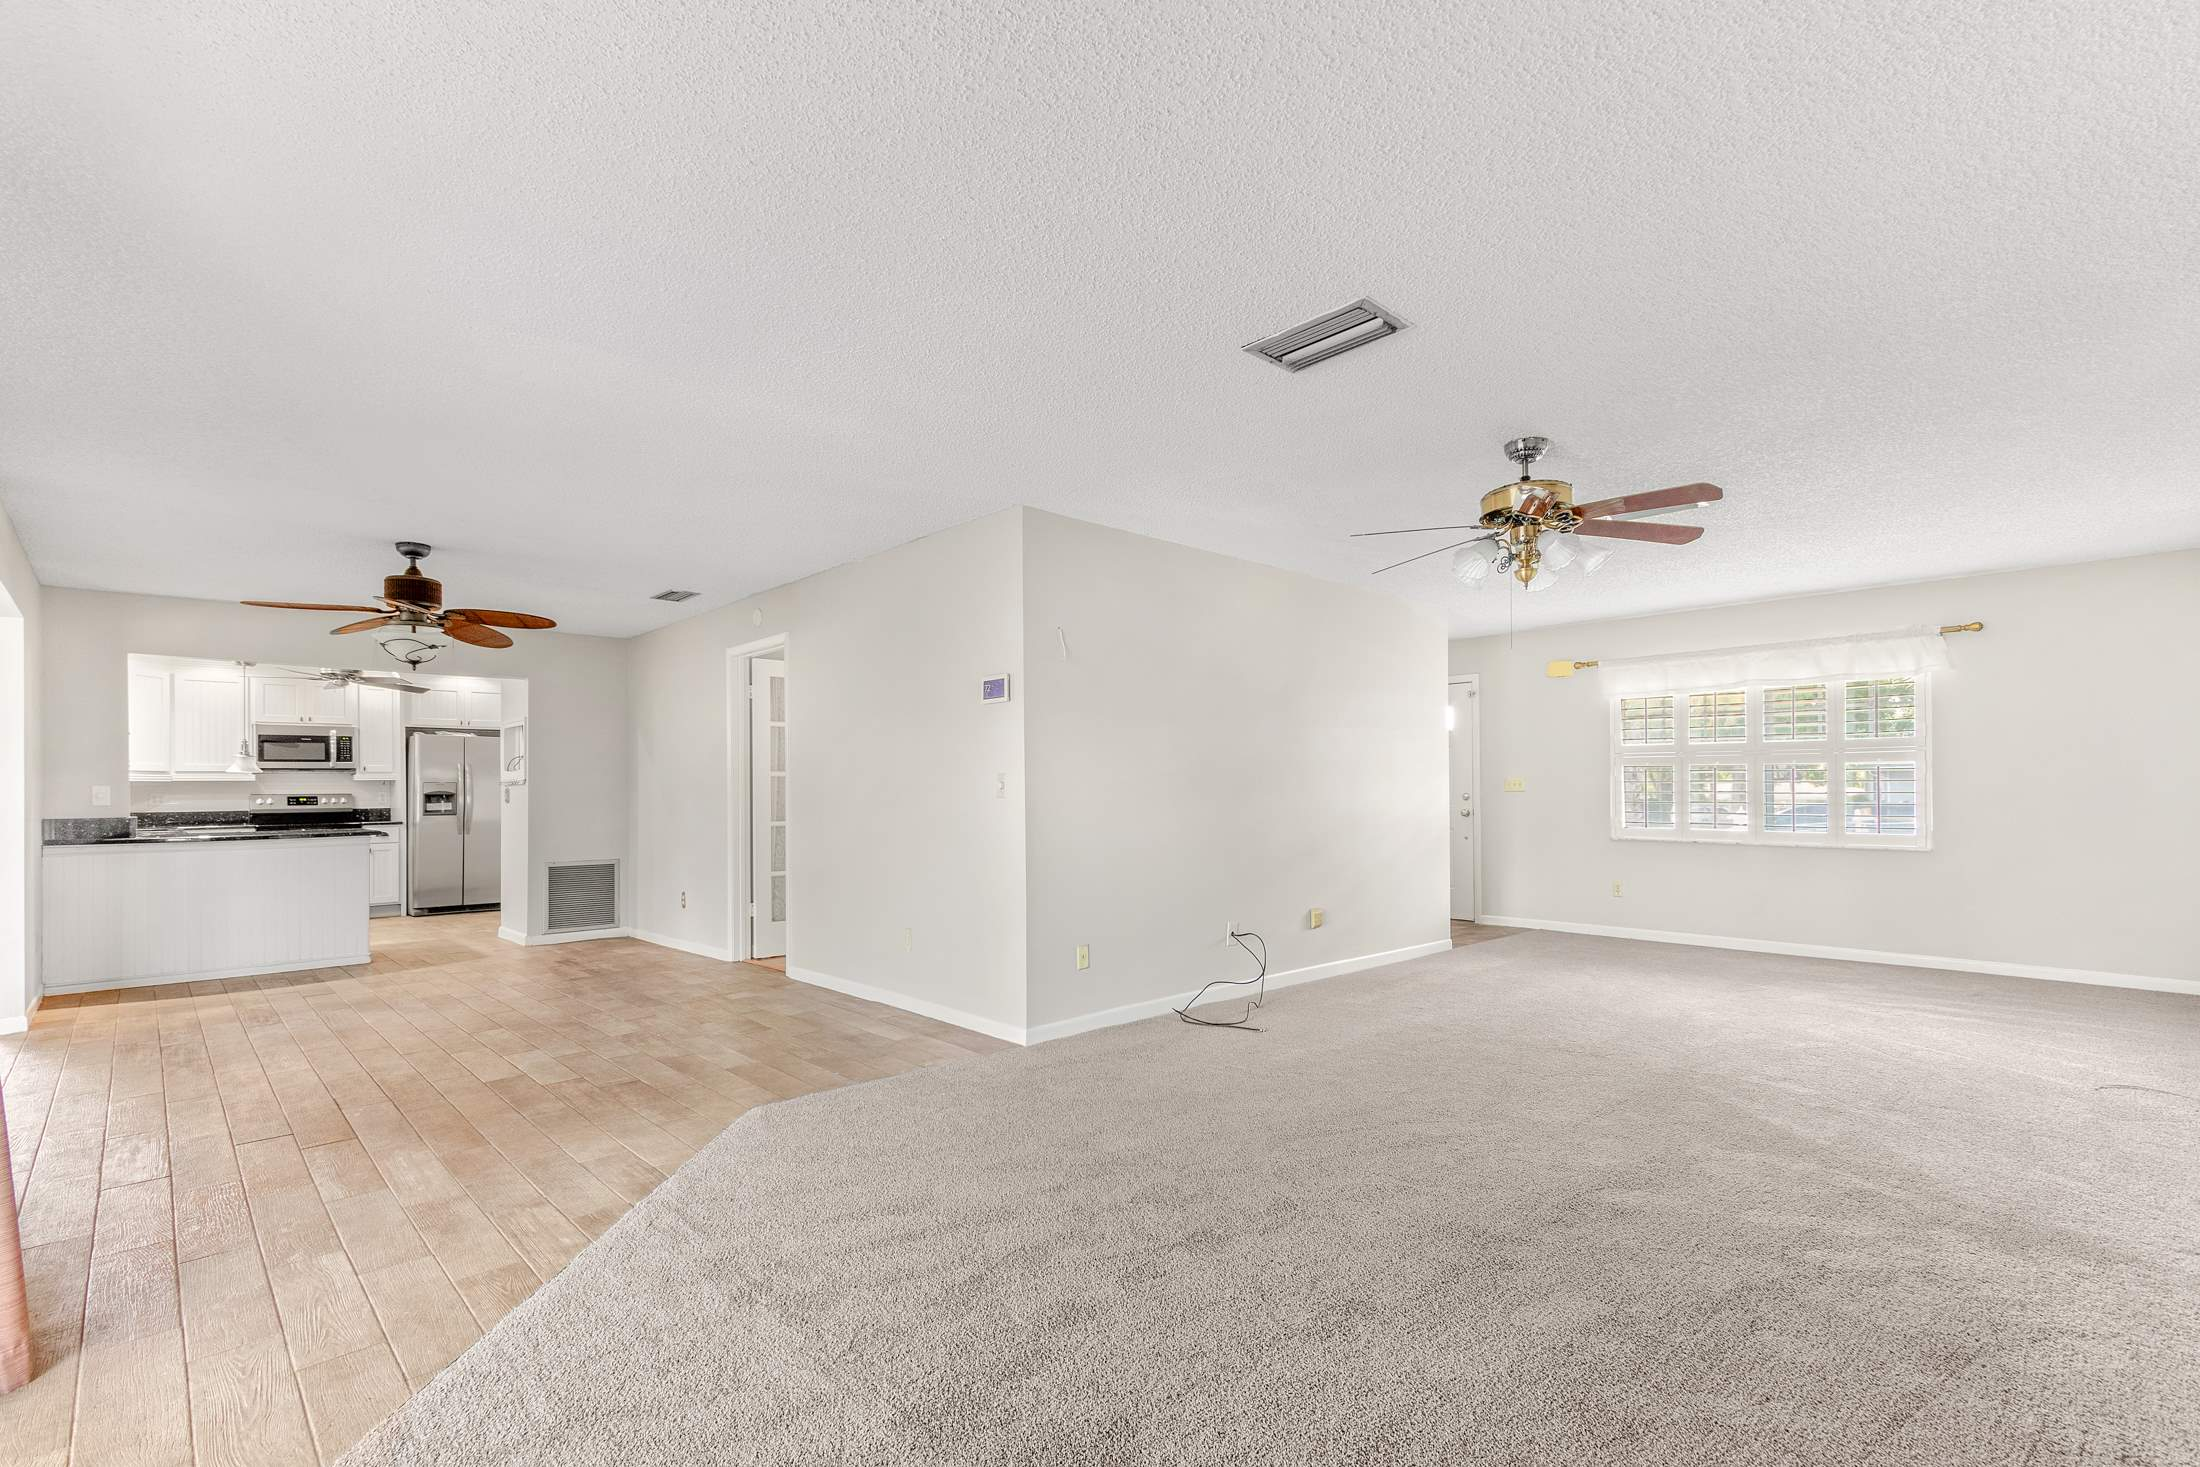 410 Travino Ave, Saint Augustine, FL 32086